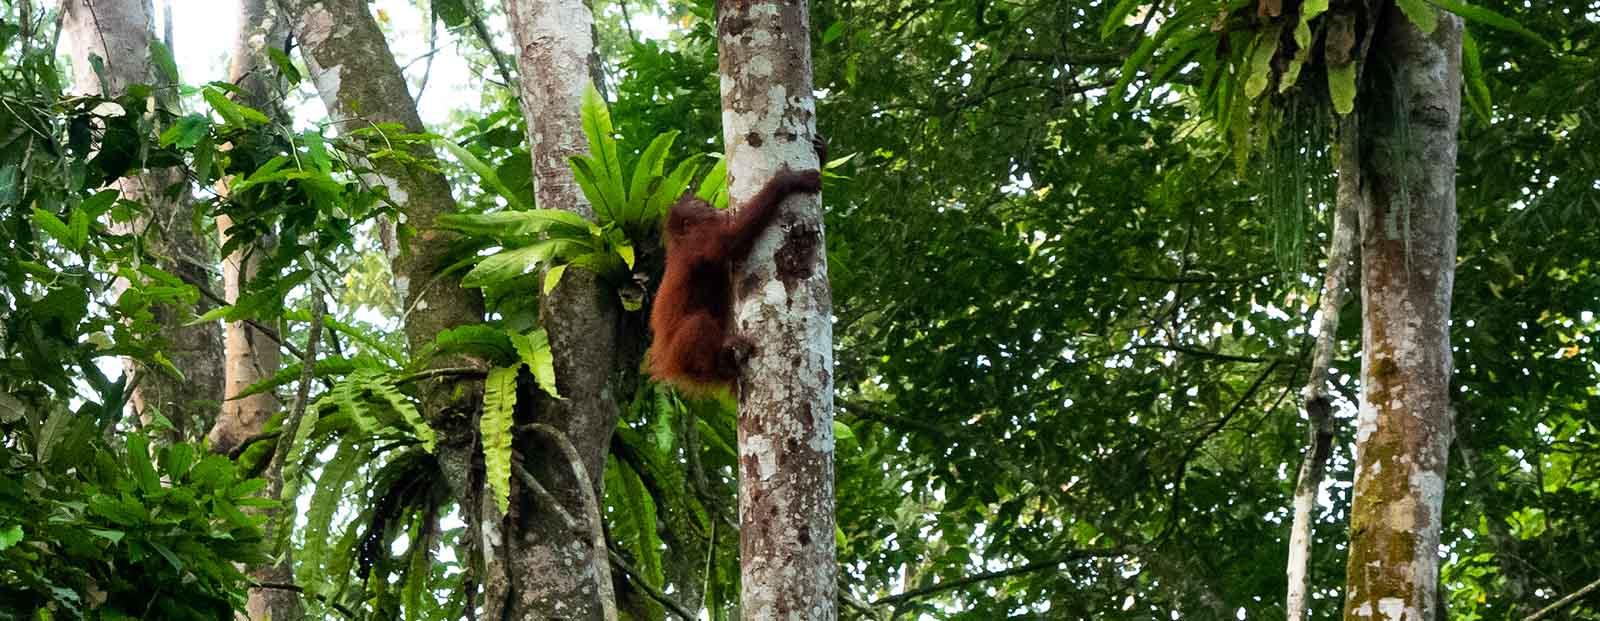 Cry of the Wild: Orangutan Encounters in Borneo